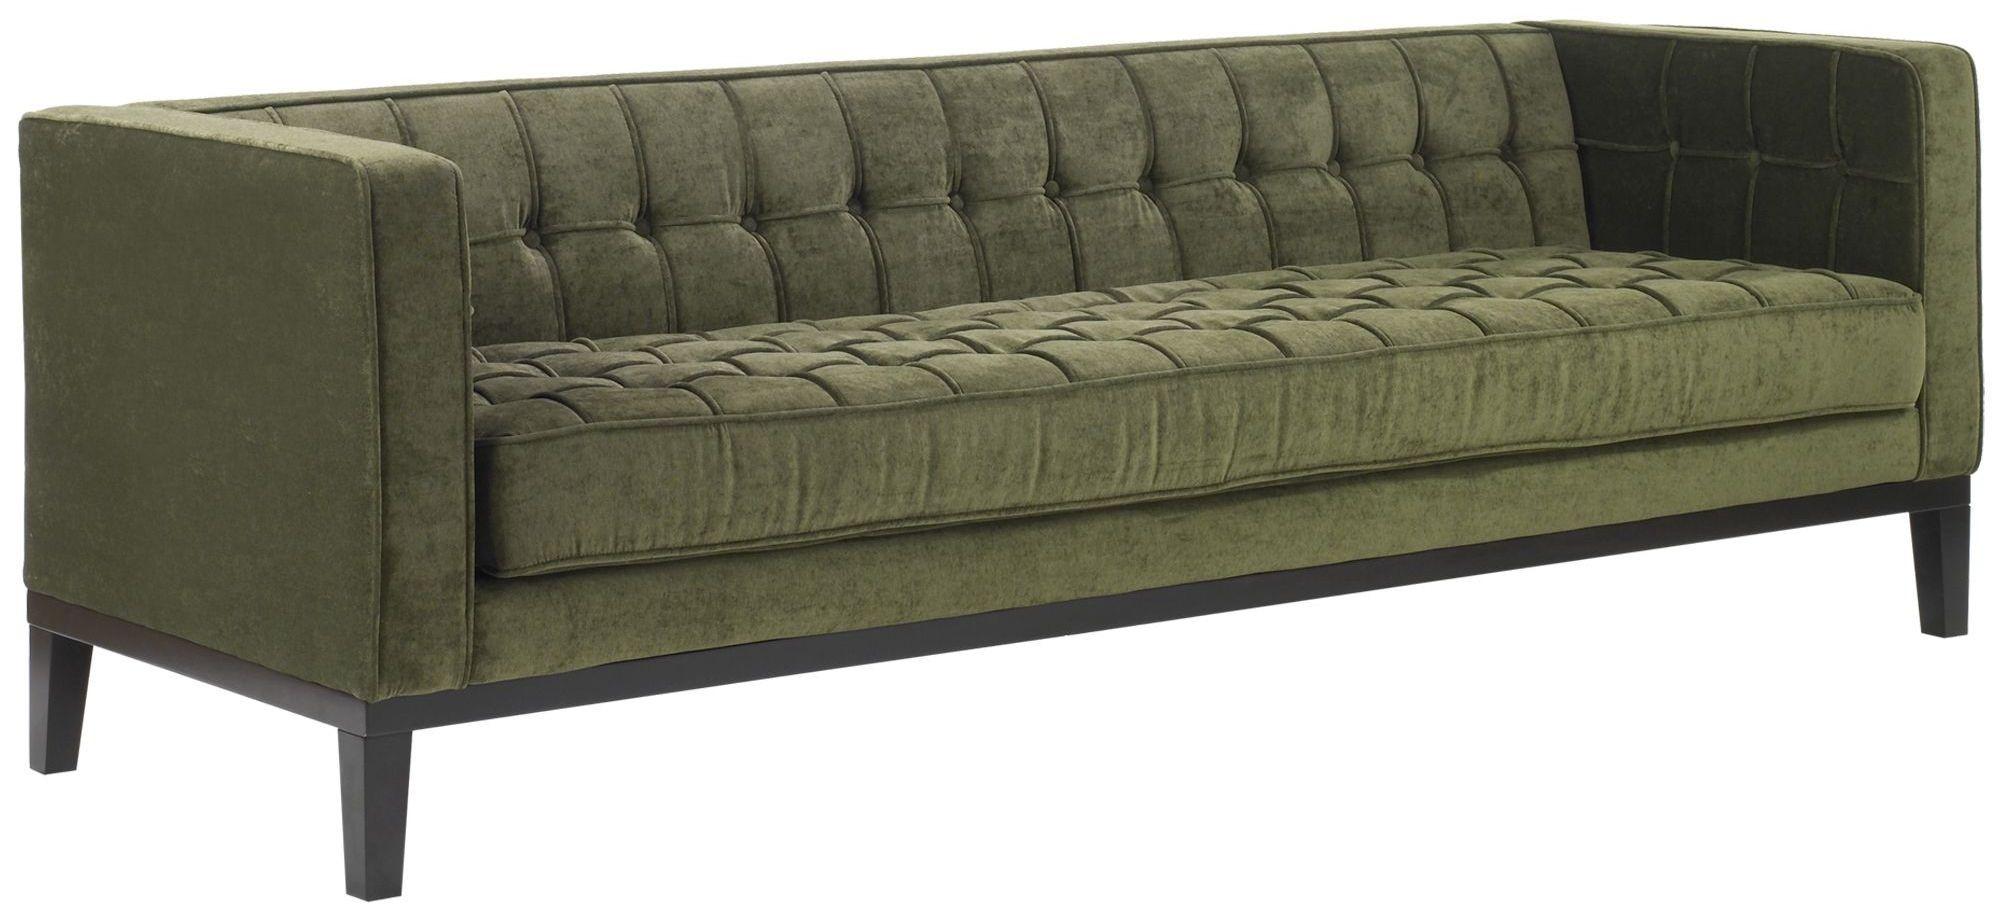 green fabric sofas sofa throw roxbury tufted lc10103gr armen living